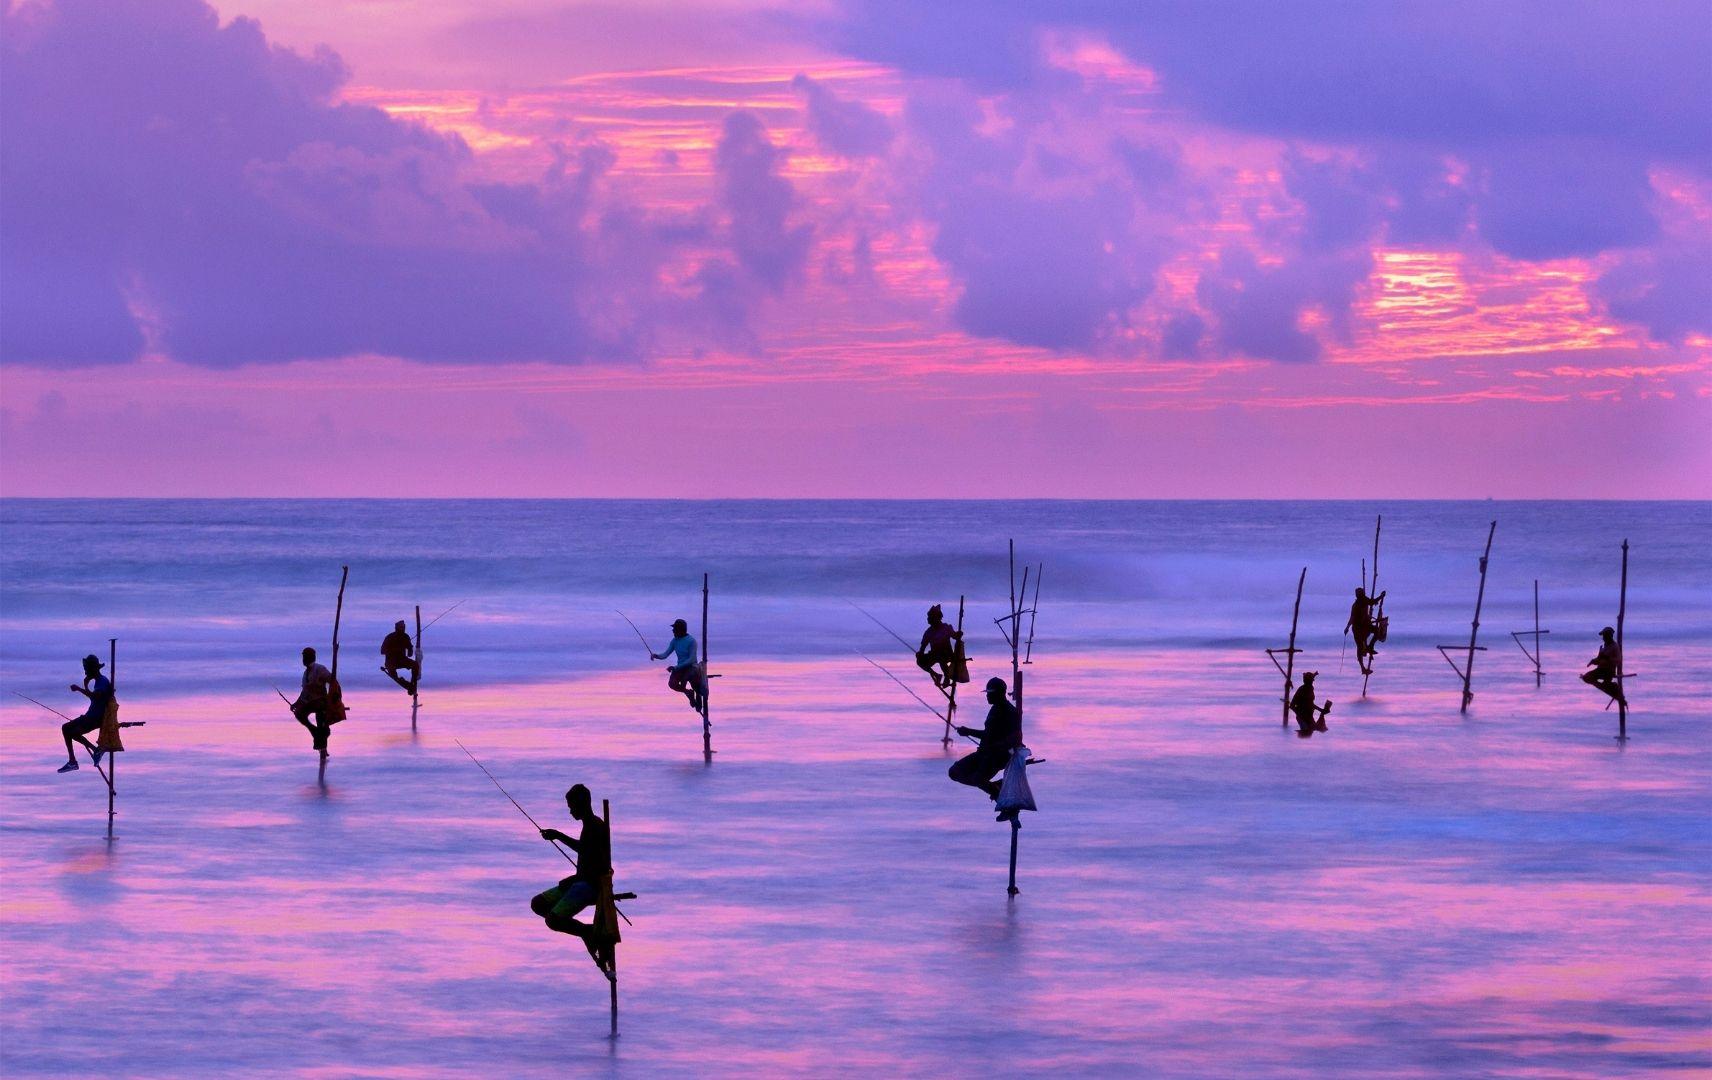 Fischer Sri Lanka